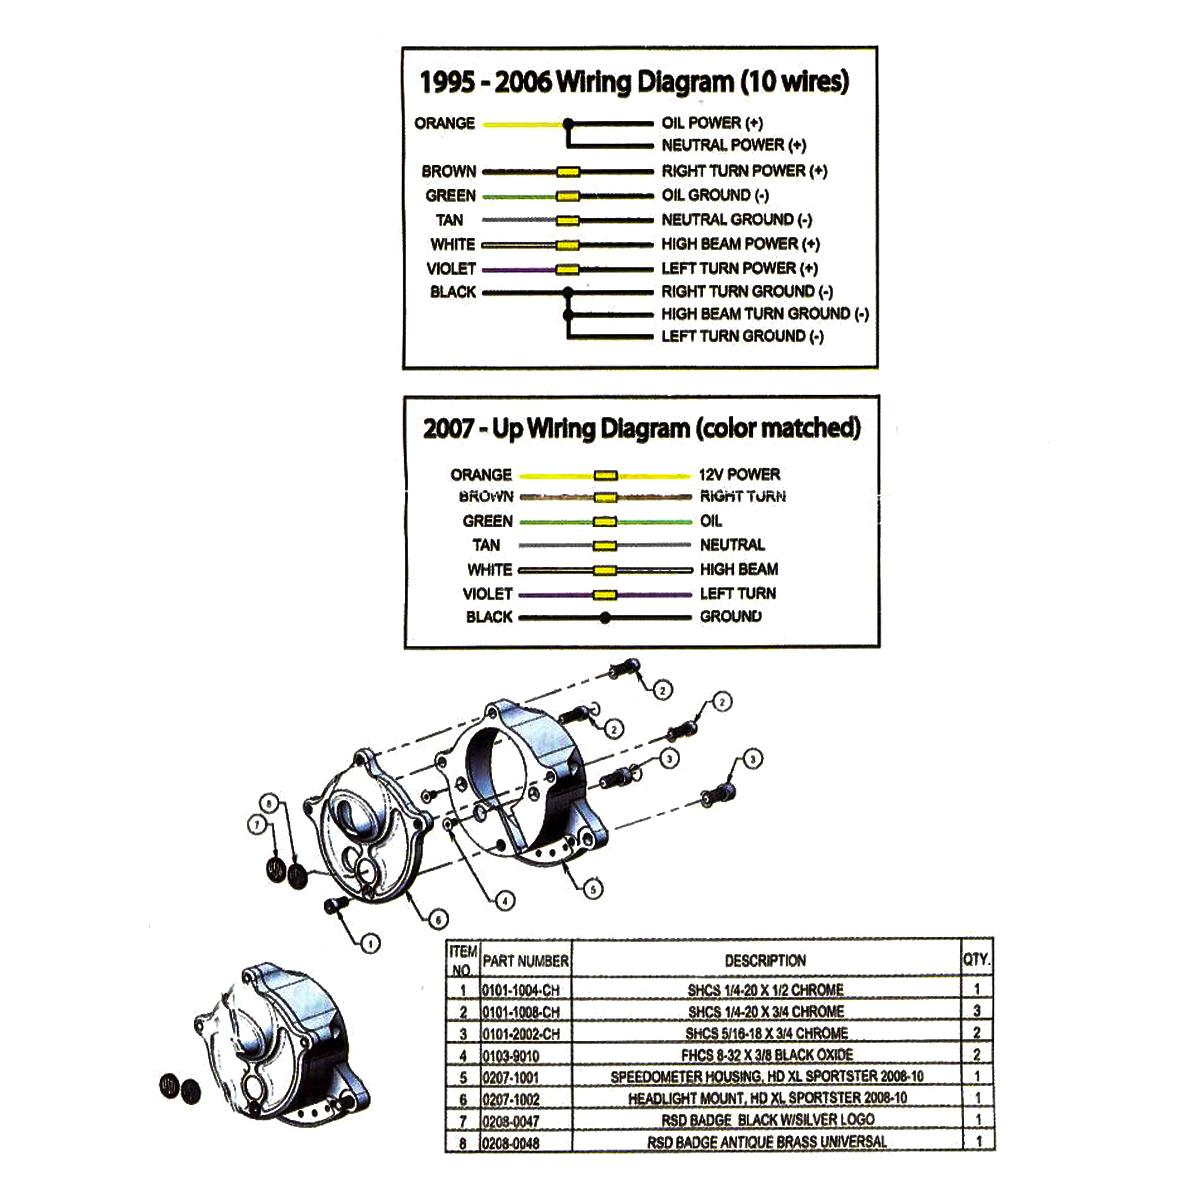 Wiring Diagram Sportster on 2007 road glide wiring diagram, 2007 sportster seats, harley wiring diagram, 2007 dyna wide glide wiring diagram, 2007 street bob wiring diagram, 2007 street glide wiring diagram, 2007 sportster clutch, 2007 heritage softail wiring diagram, 2007 flhx wiring diagram, 2007 corvette wiring diagram, 2007 sportster exhaust, 2007 bmw wiring diagram, 2007 polaris wiring diagram, 2007 ranger wiring diagram, 2007 gti wiring diagram, 2007 fleetwood wiring diagram, 2007 sportster owner's manual, 2007 sportster engine, 2007 sportster parts, 2007 sportster frame,